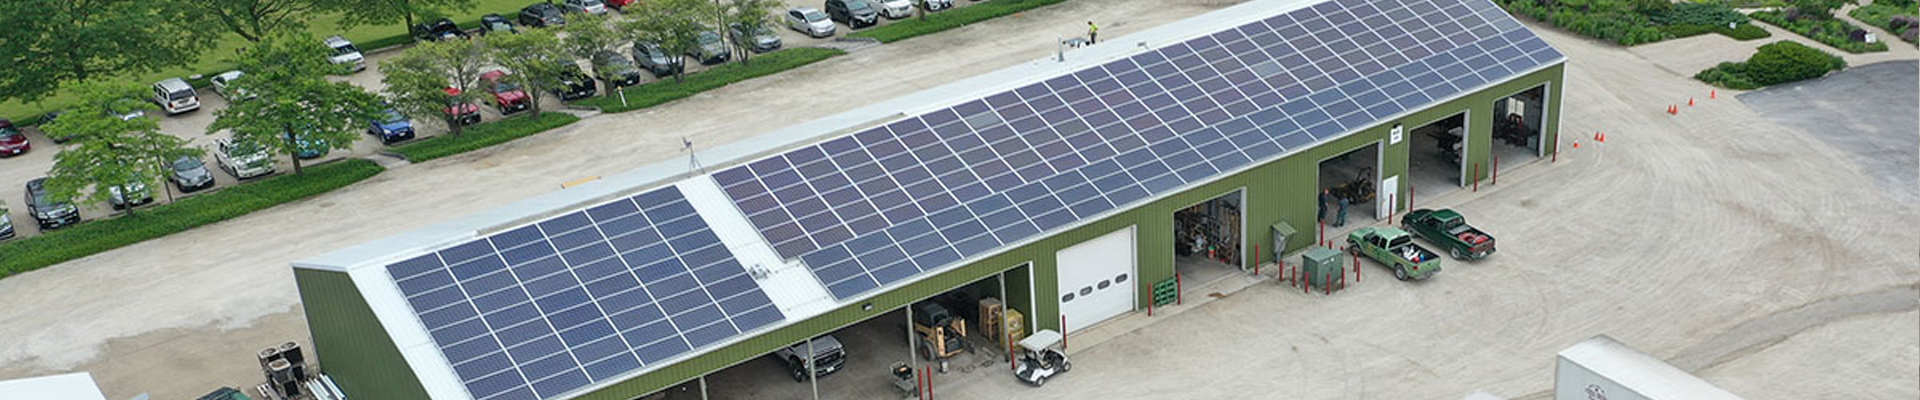 solar panels 1920215400